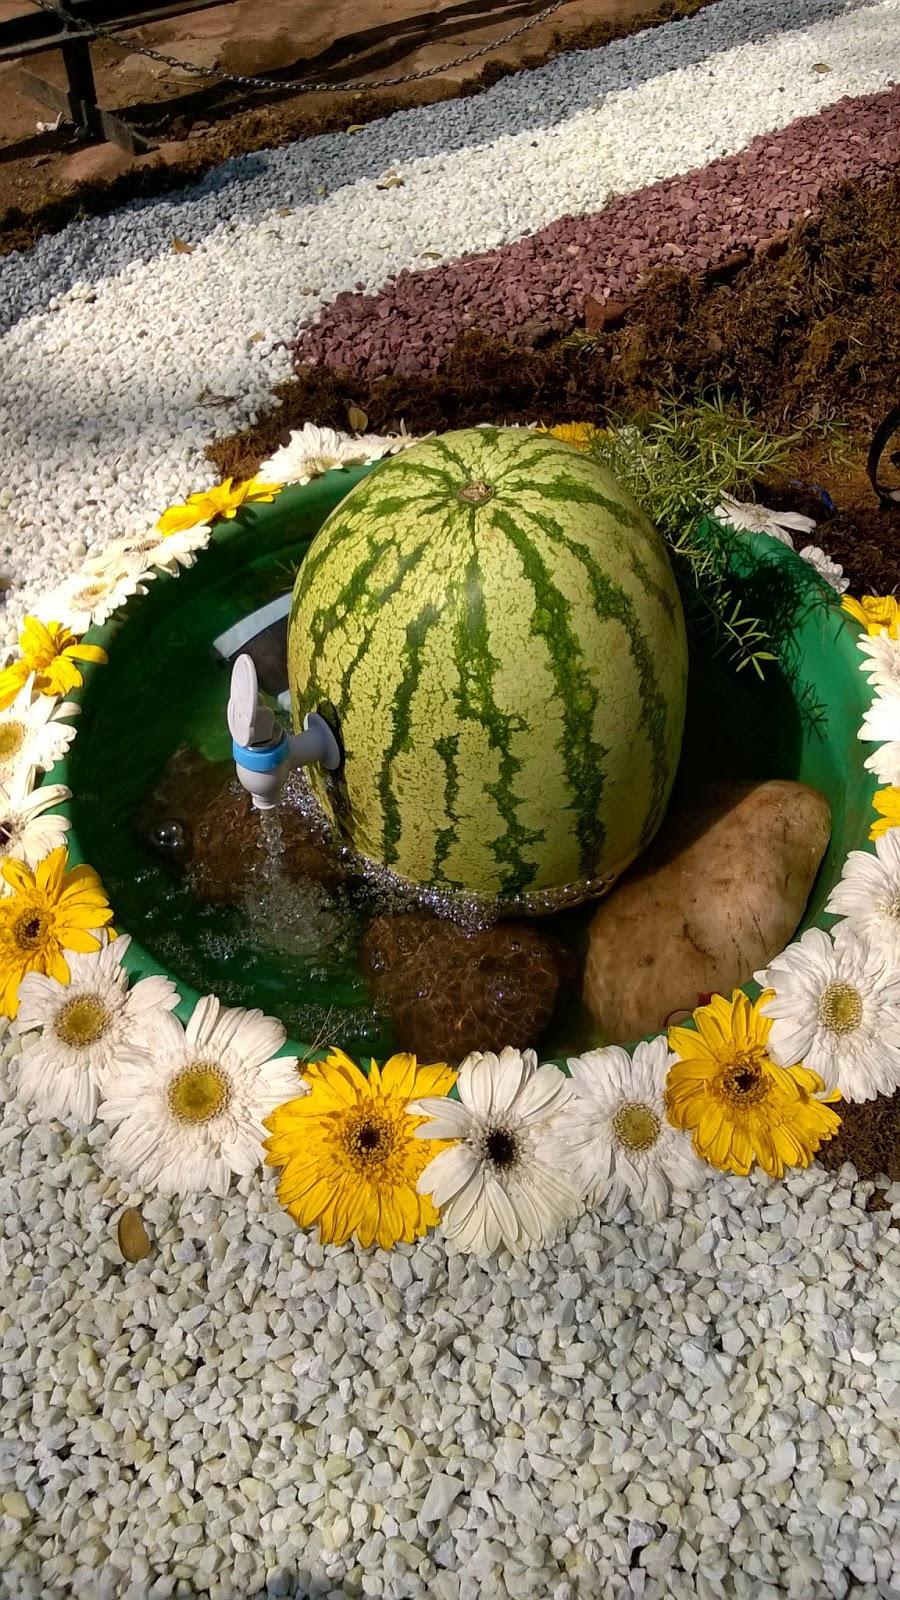 pune, gardens, water melon